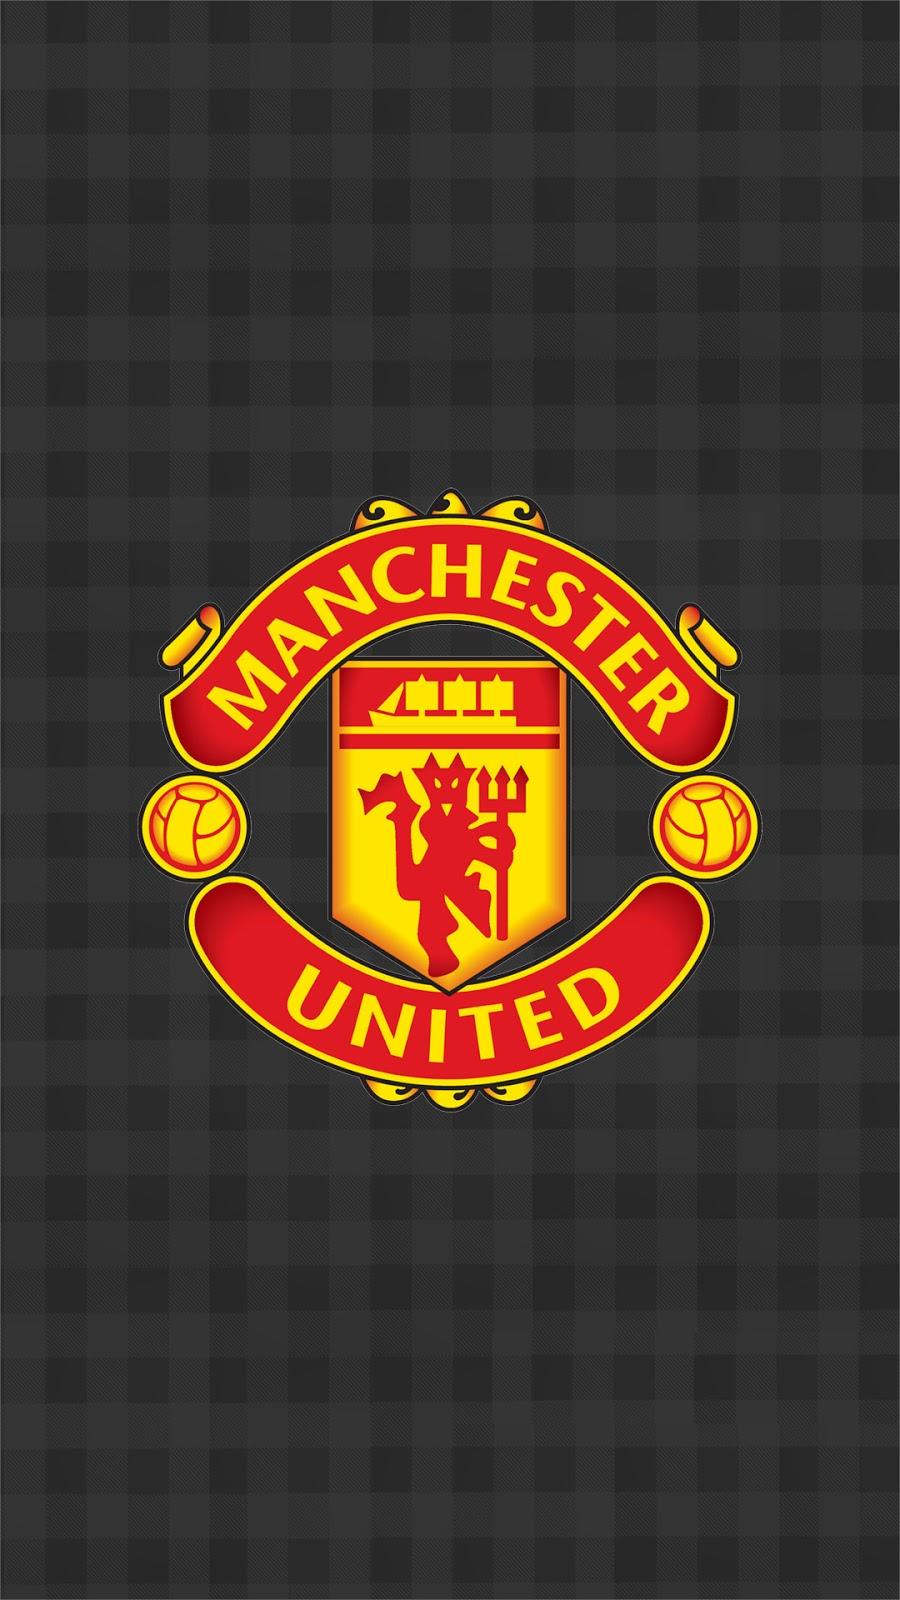 Manchester United Wallpaper For S4